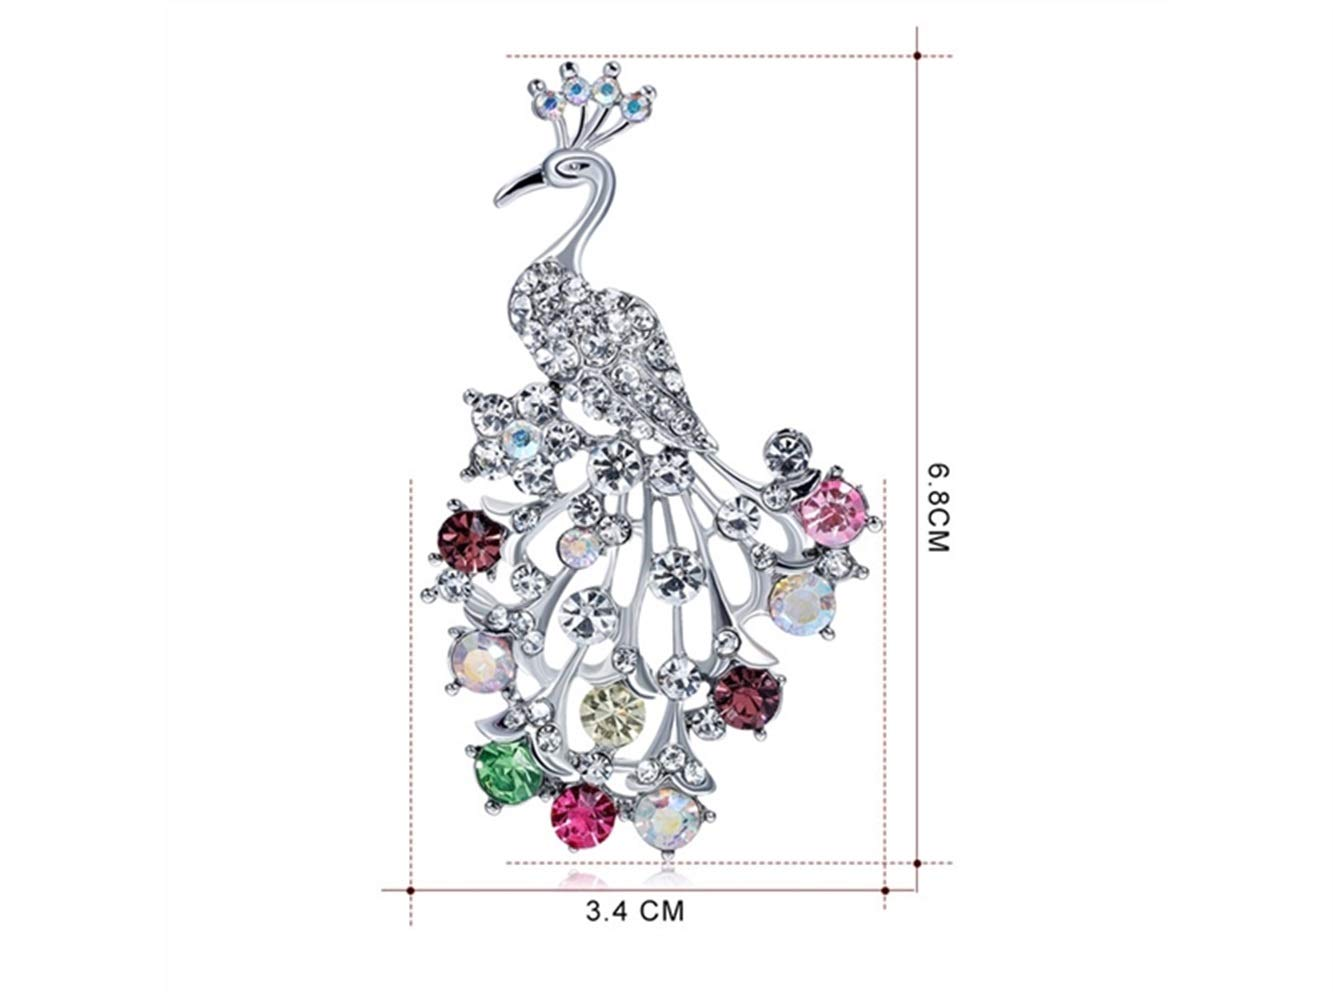 DOOUYTERT Peacock Wedding Bridal Spilla Dress Sciarpe Scialle Clip Lady Bag Ornament Gift (Argento + Coloful) (Colore : Colorful, Dimensione : 3.4x6.8cm)